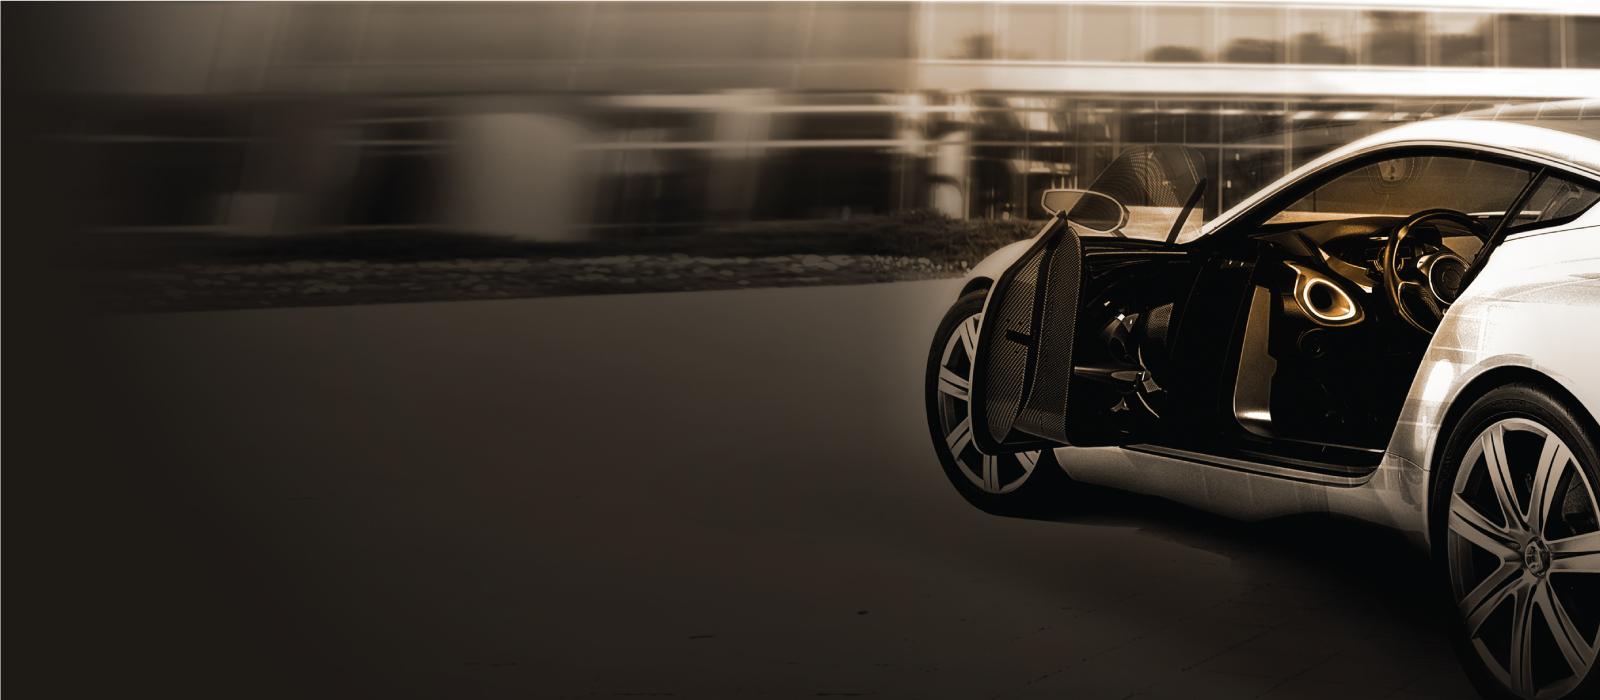 1600x700-elite-car1